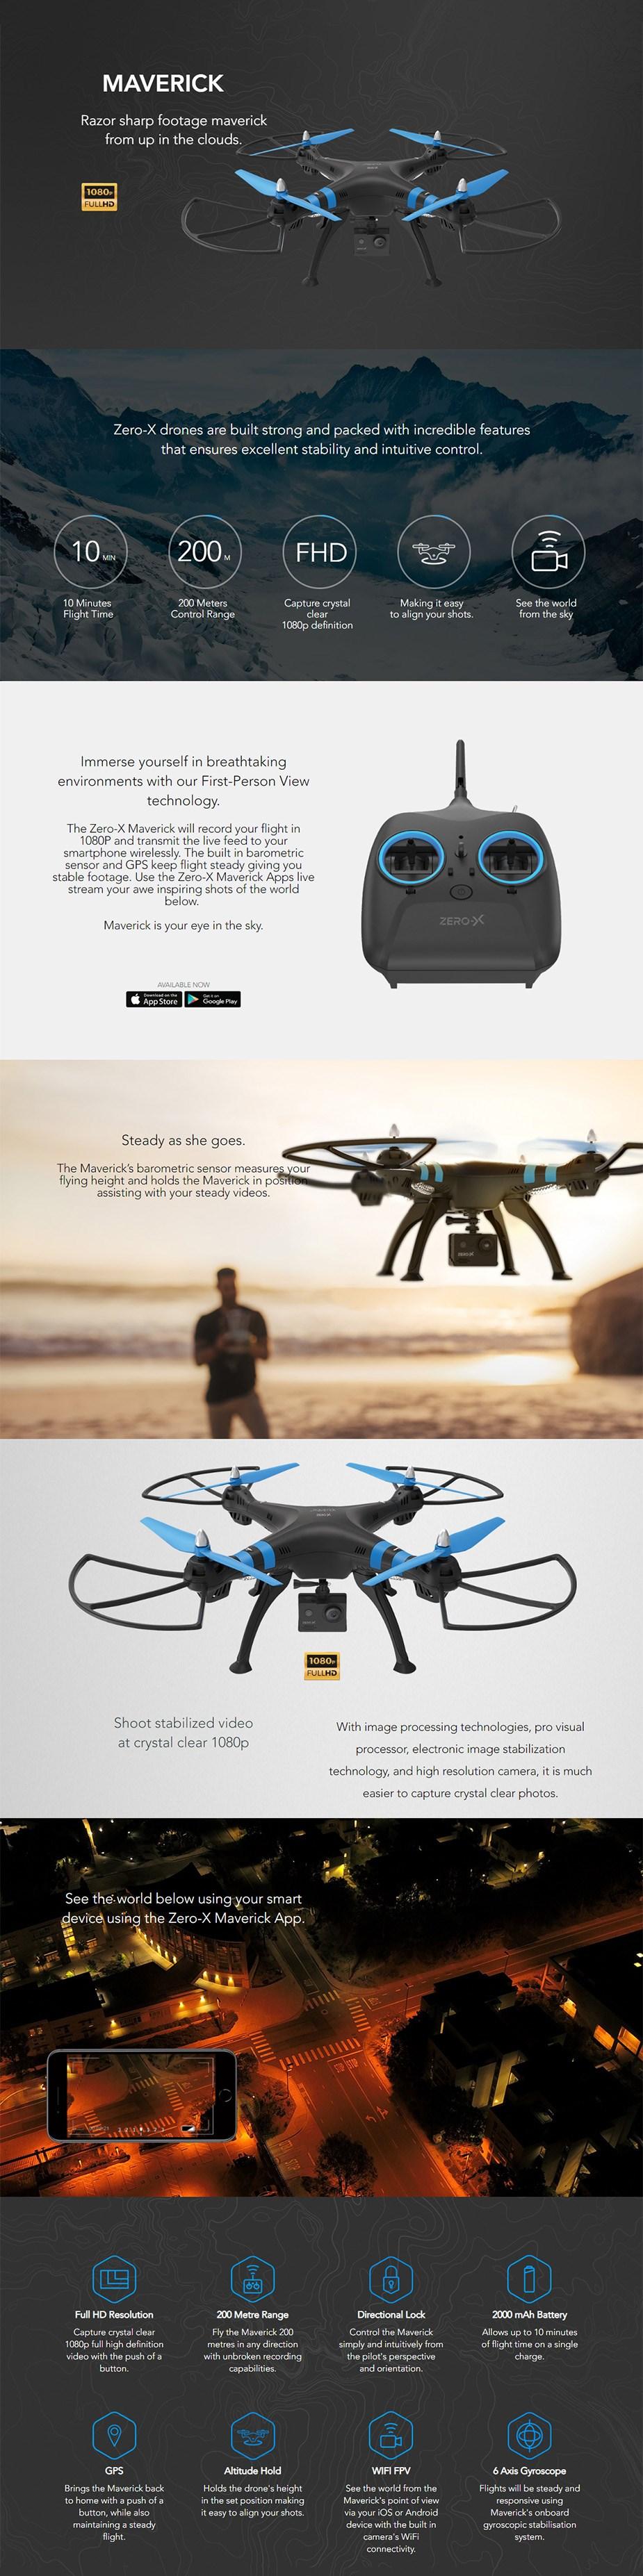 Zero-X Maverick 1080p FPV Drone - Desktop Overview 1